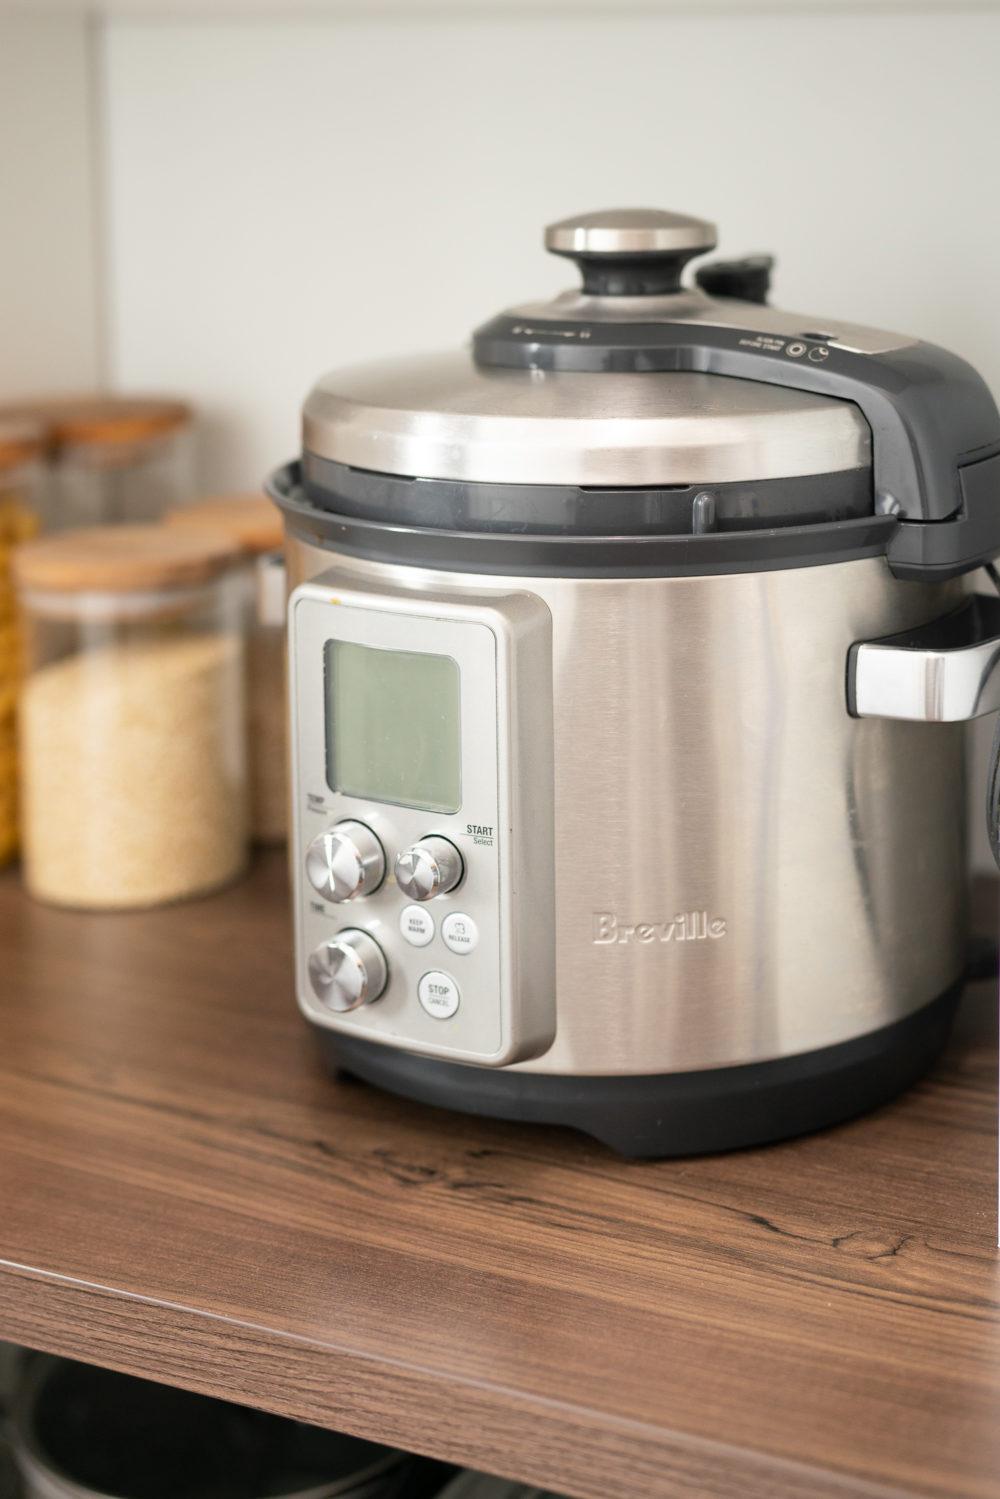 Petite Fashion Blog | eBay Home Appliances | Breville Pressure Cooker